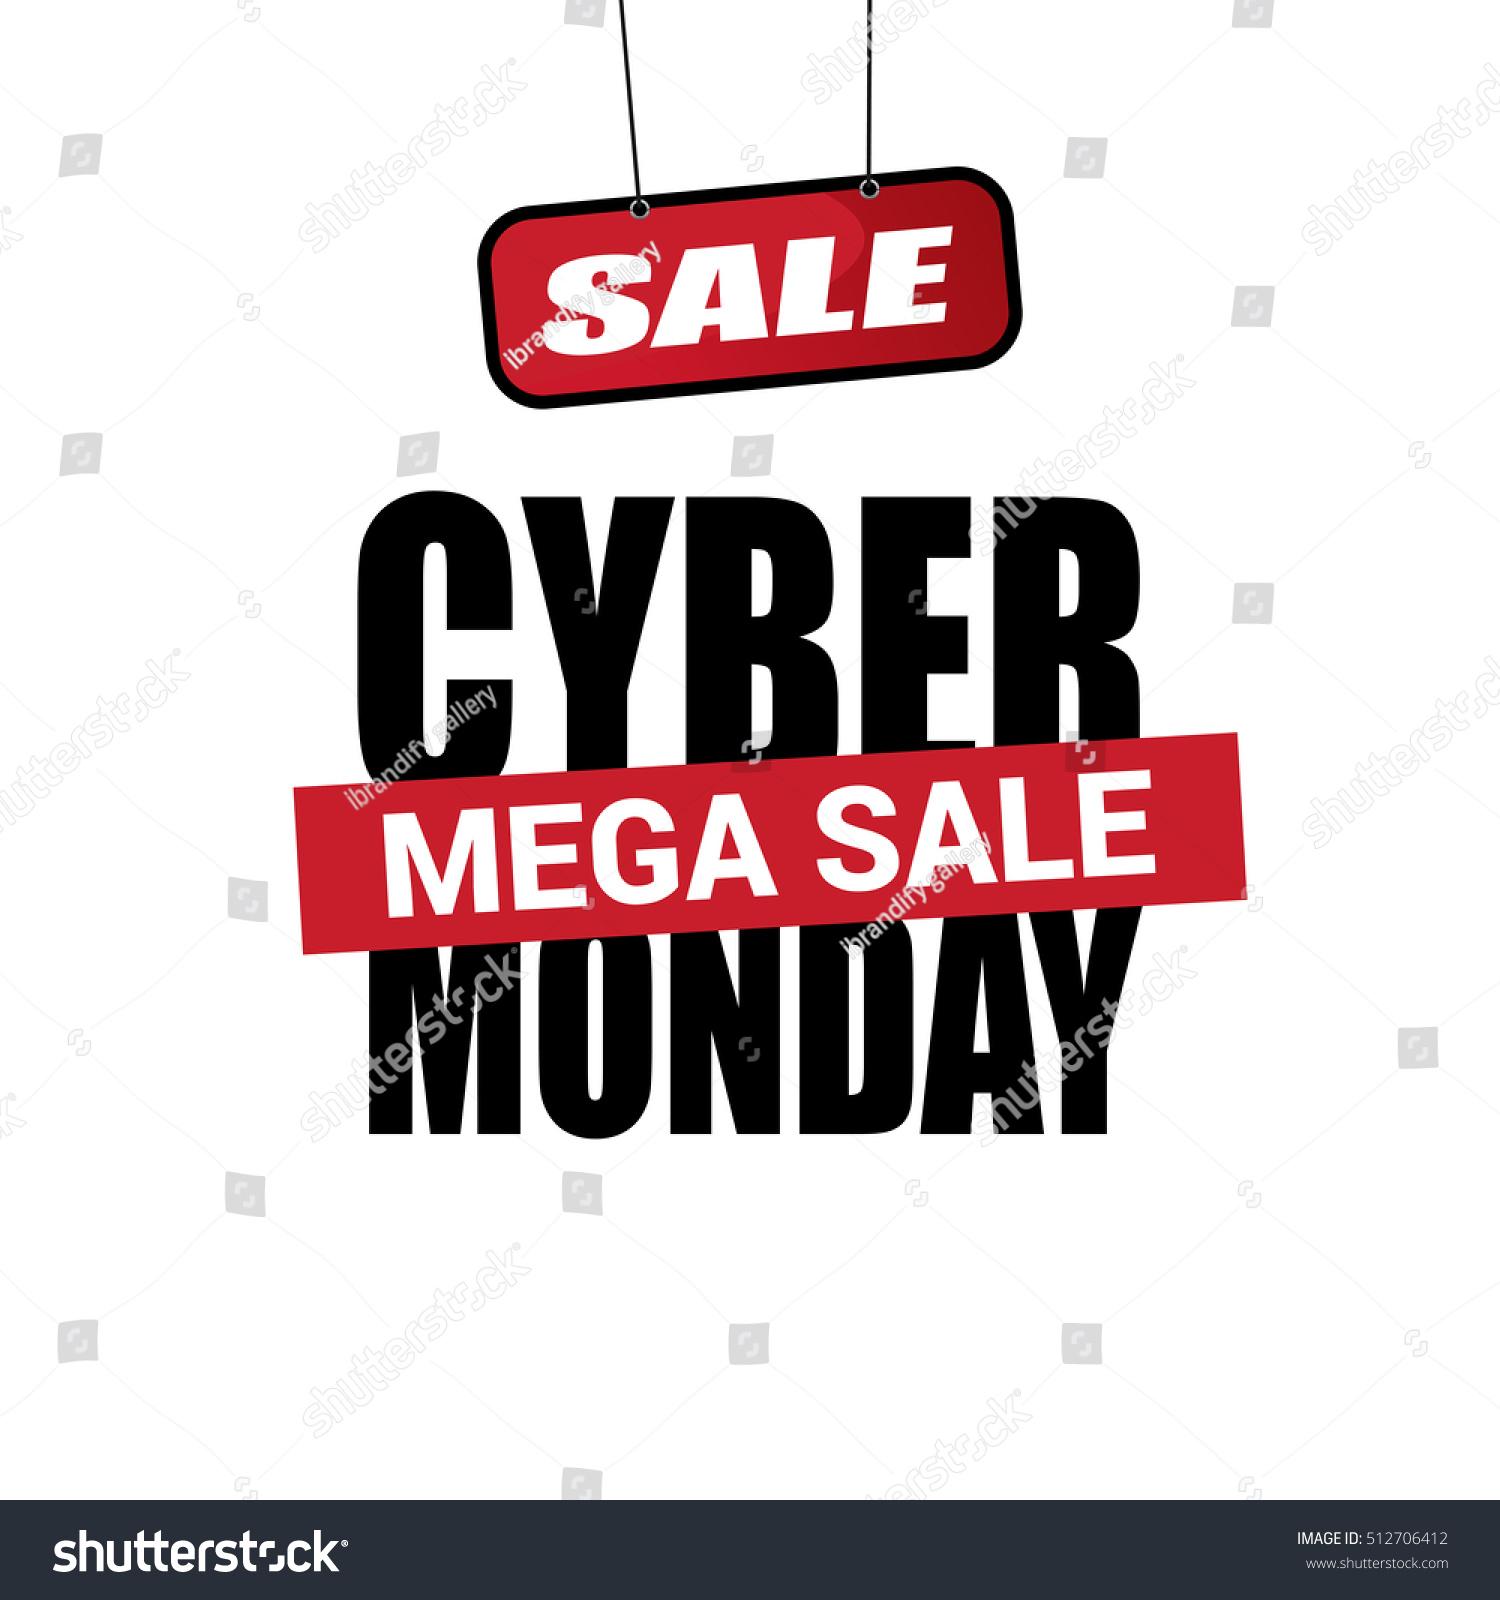 Cyber Monday Sale Inscription Design Template Image